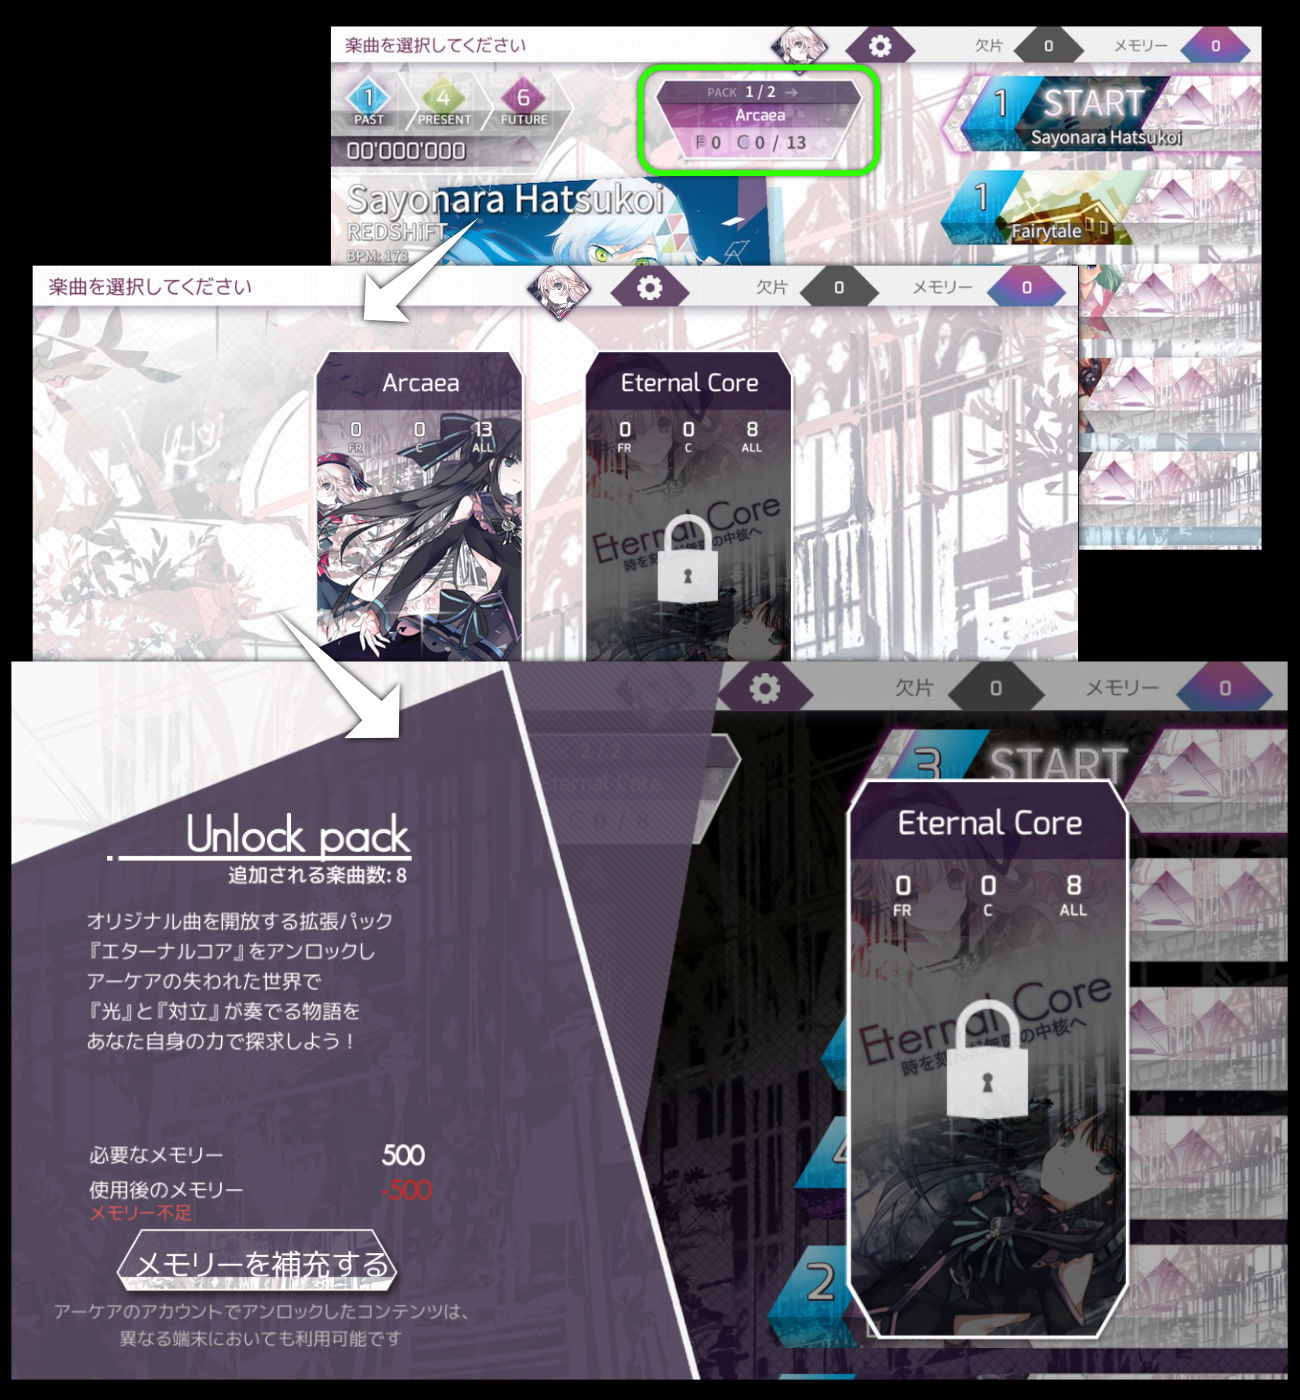 Unlock pack